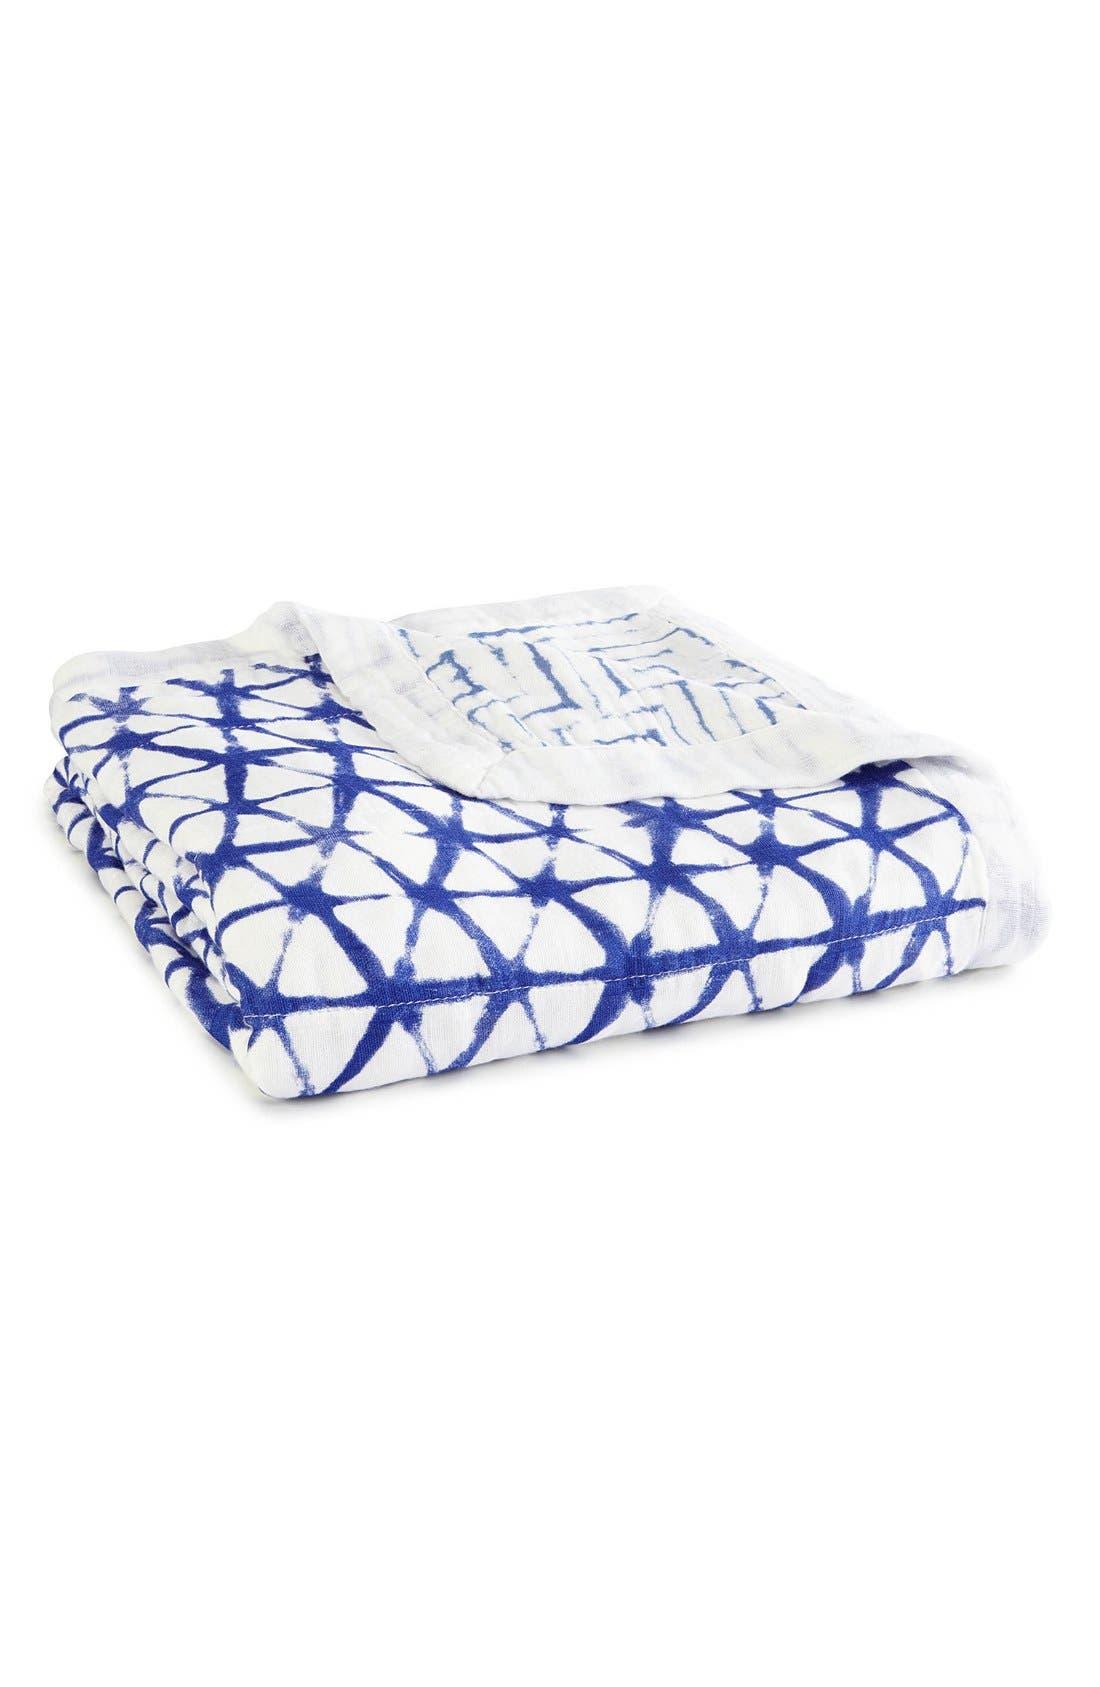 aden + anais 'Silky Soft Dream' Blanket